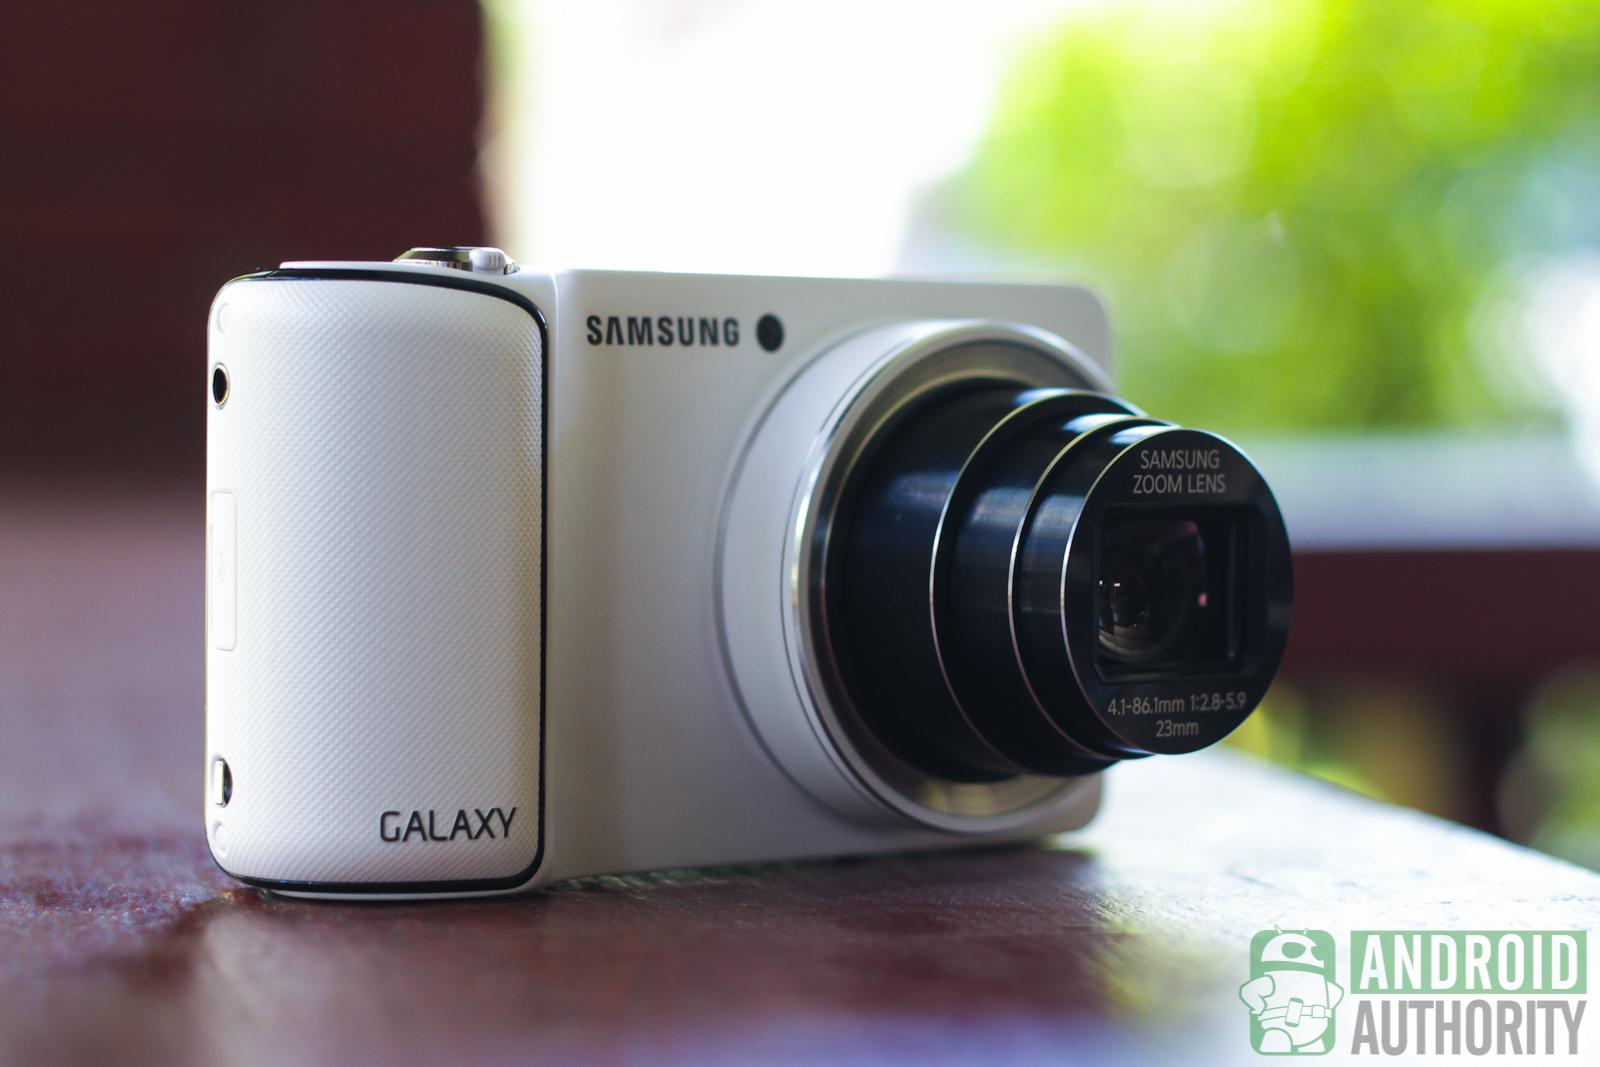 galaxy-camera-IMG_0024